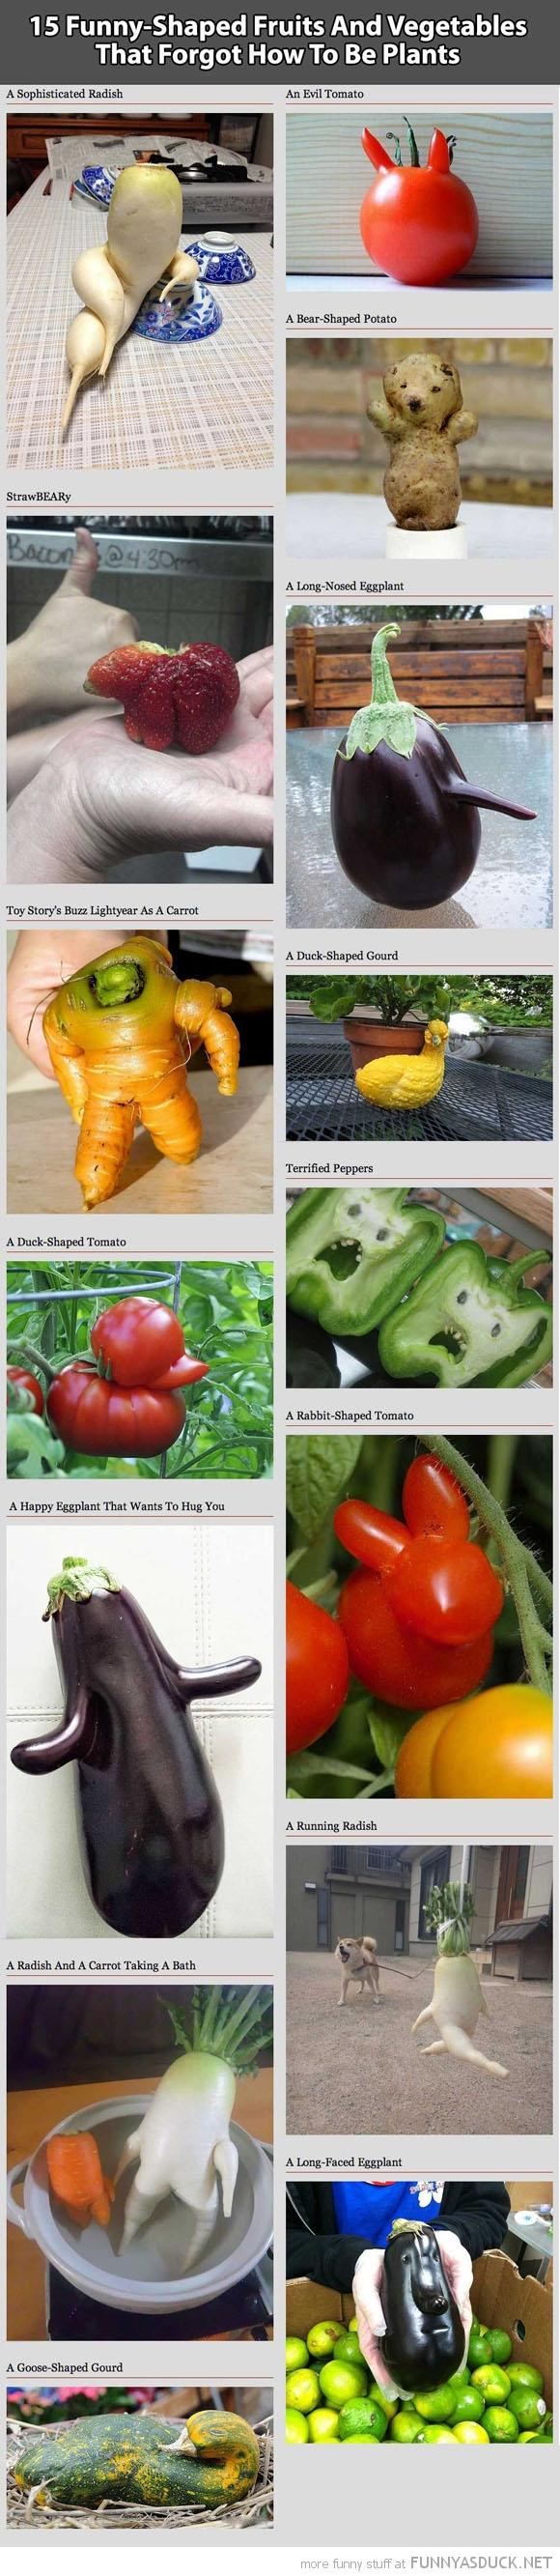 Funny Shaped Fruit & Veg